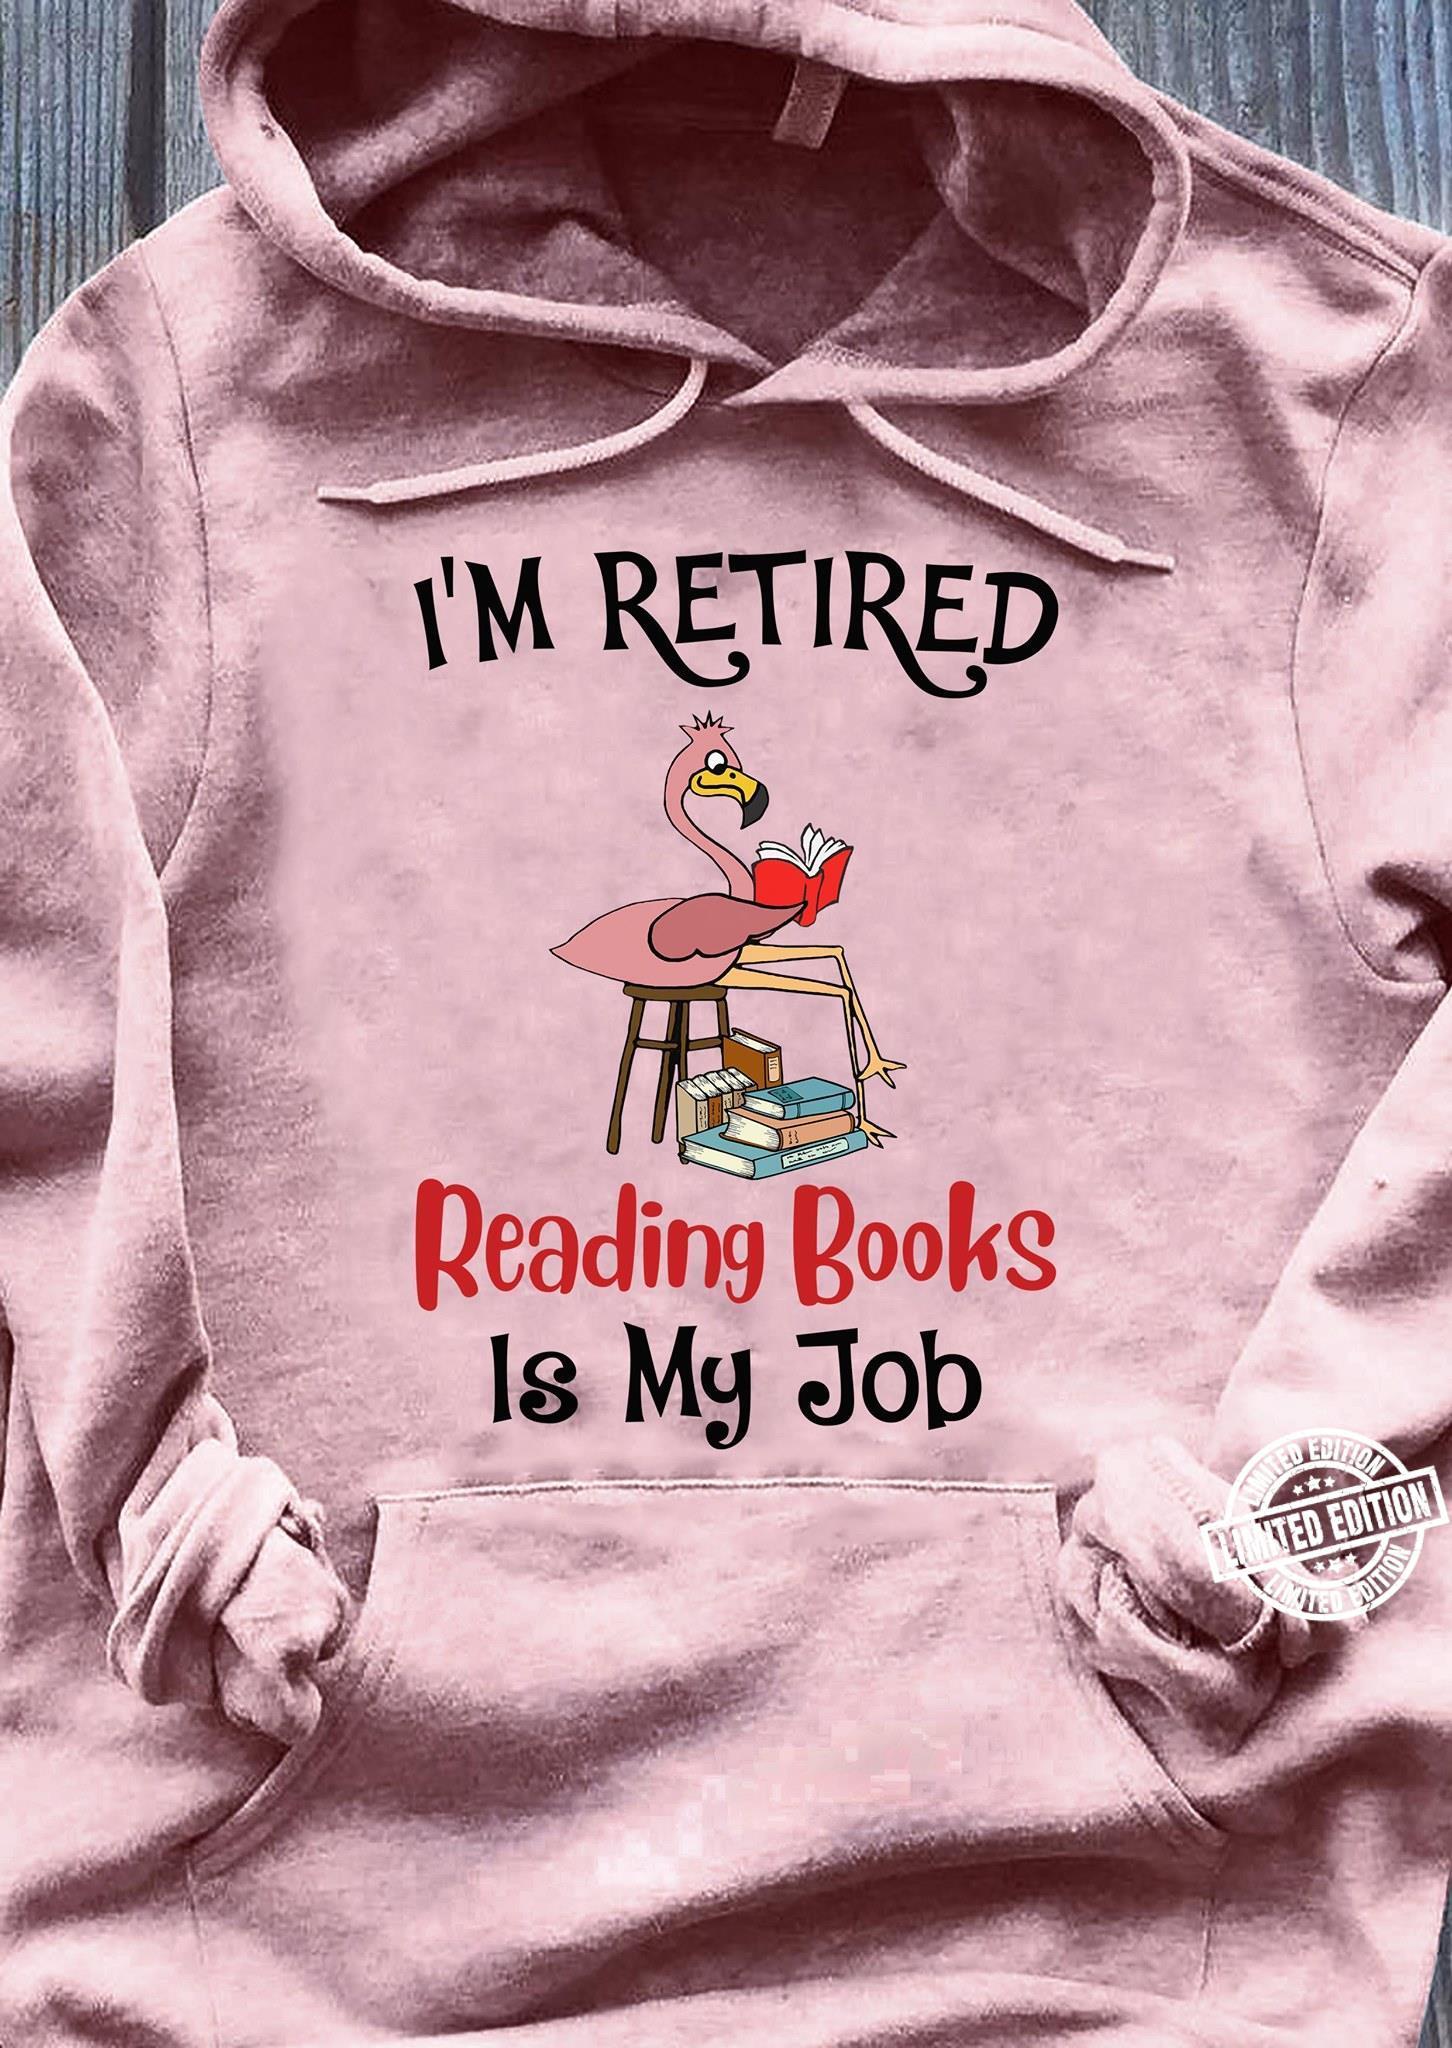 Flamingo I'm retired reading books is my job shirt